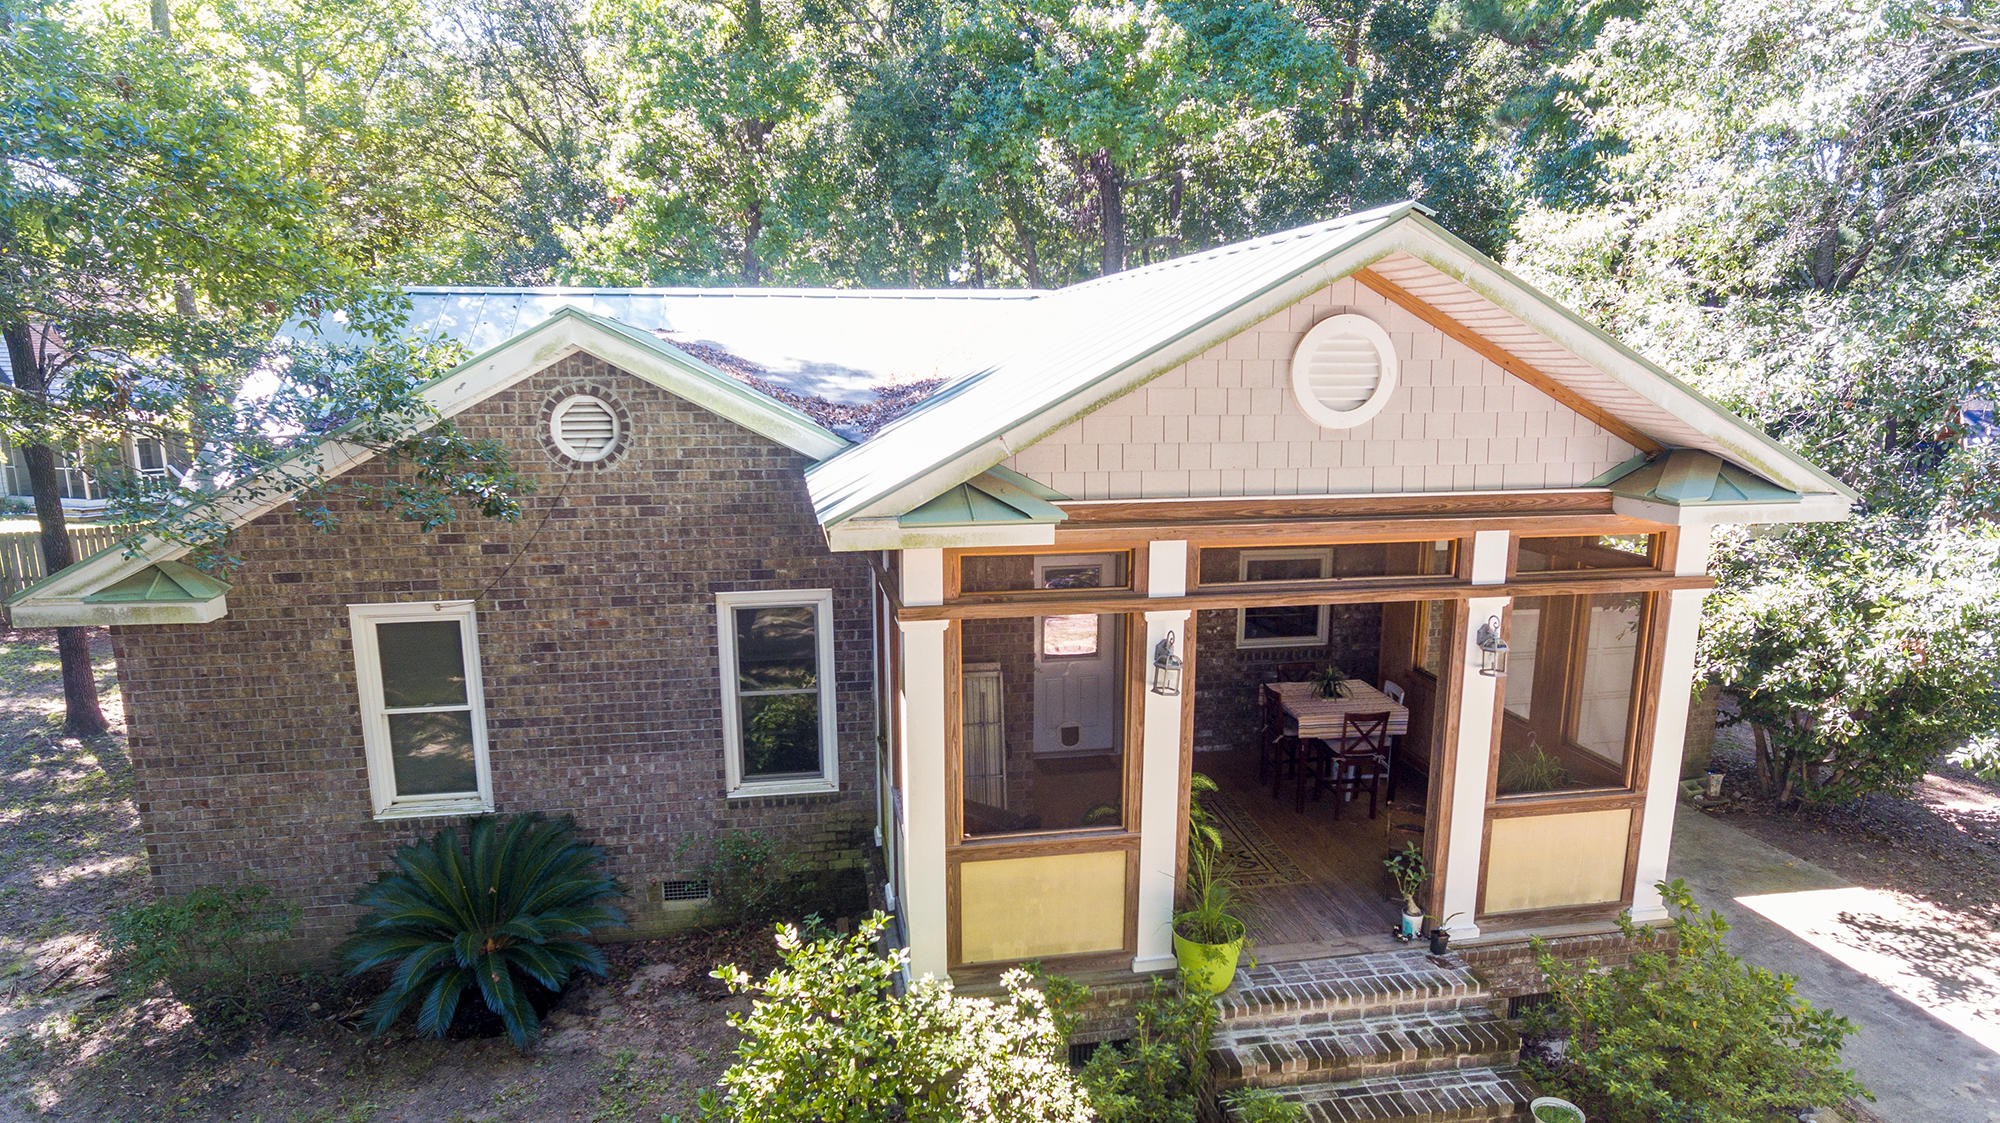 Wando Lakes Homes For Sale - 858 Fairlawn, Mount Pleasant, SC - 6